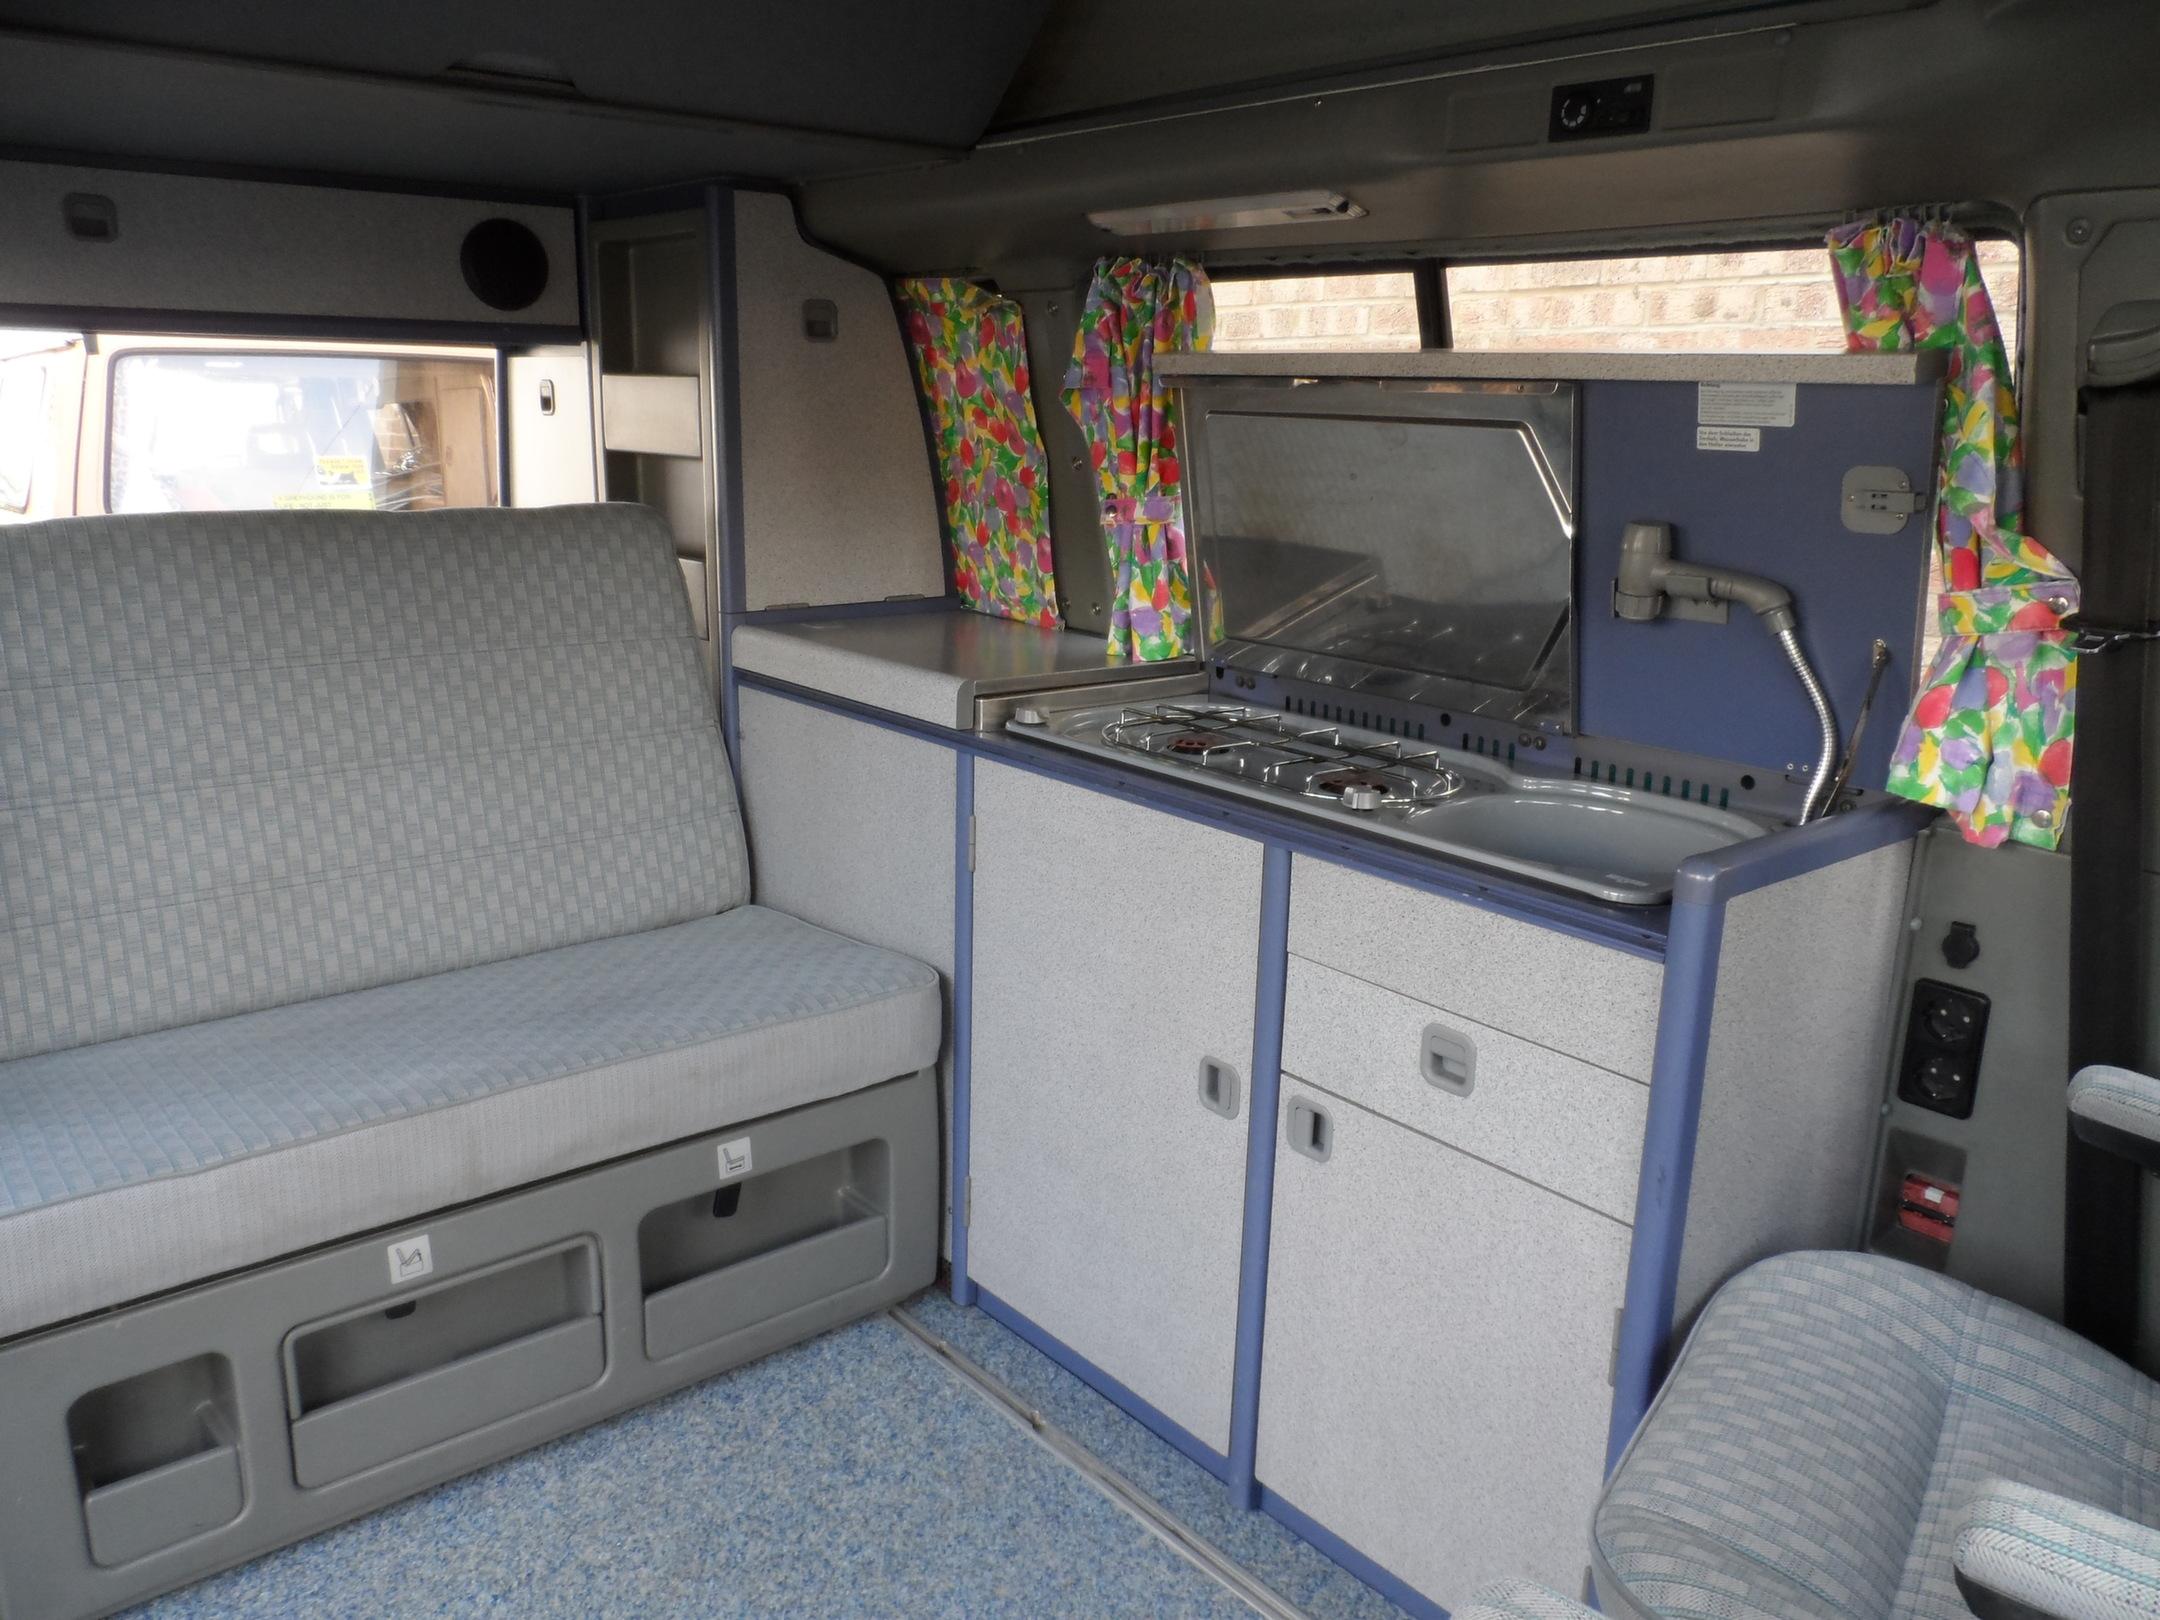 vw t4 westfalia california. Black Bedroom Furniture Sets. Home Design Ideas